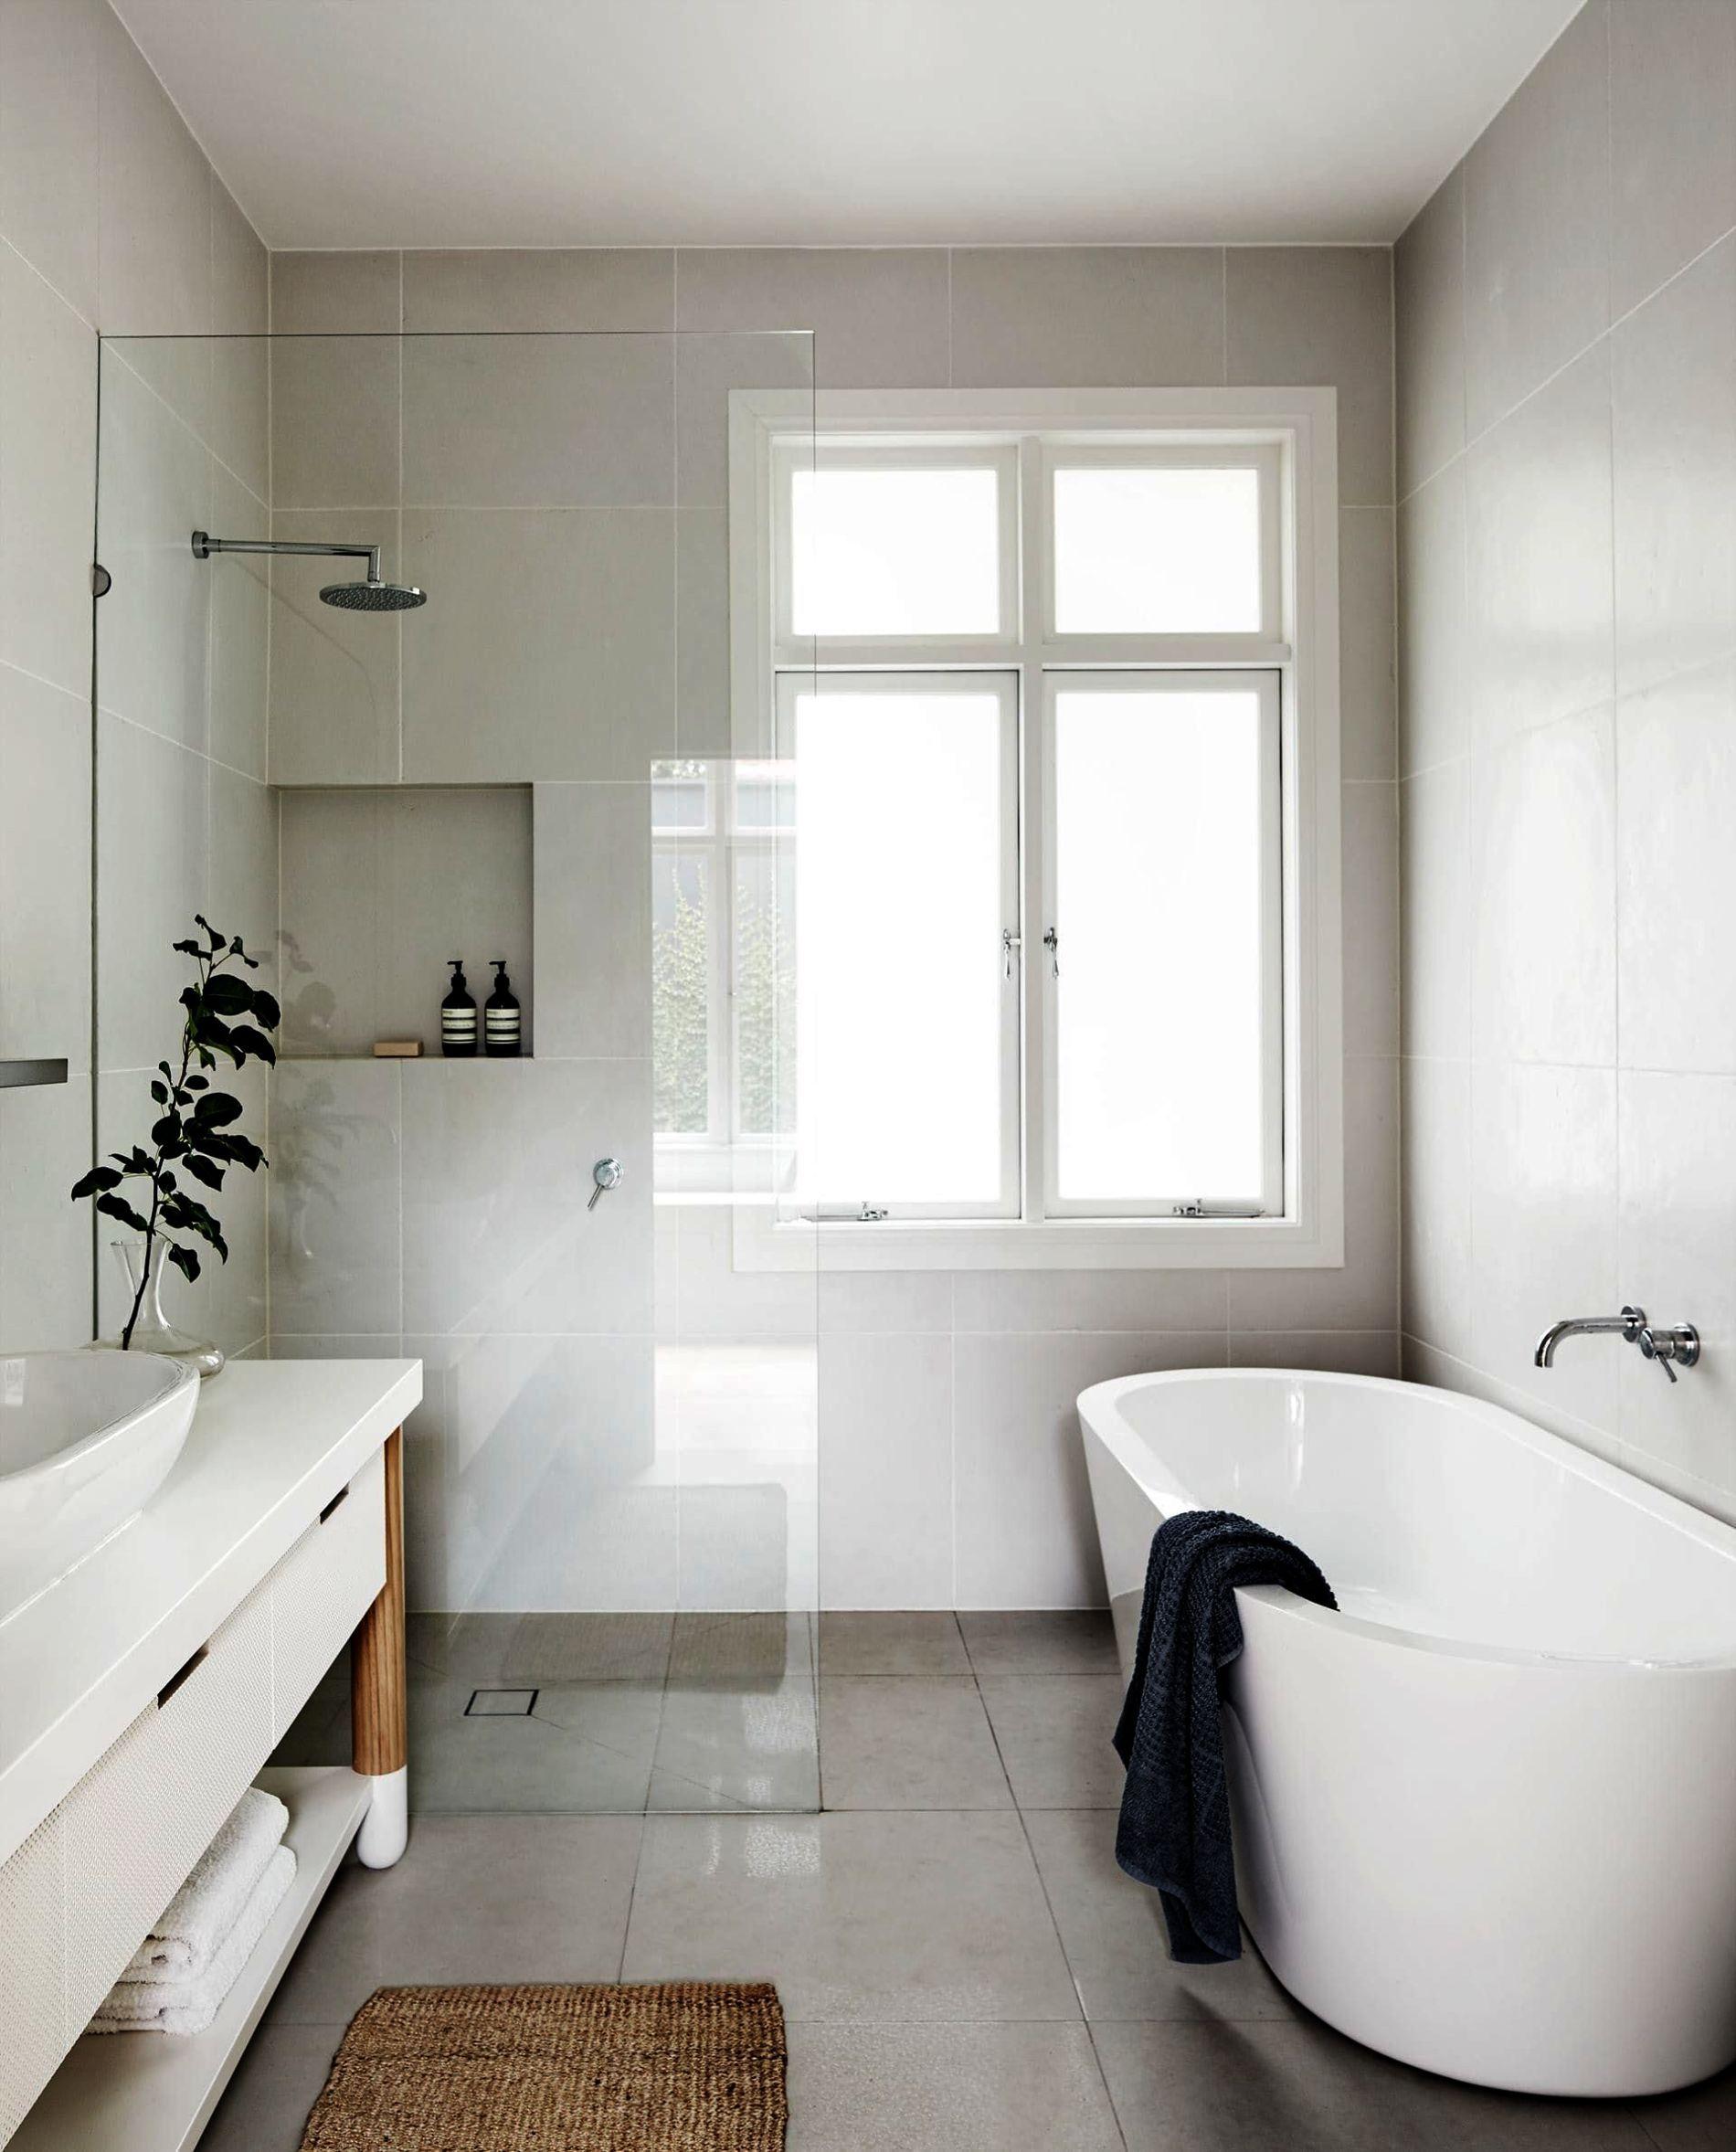 Astounding Small Bathrooms Designs Uk Bathroom Layout Small Bathroom Remodel Small Bathroom